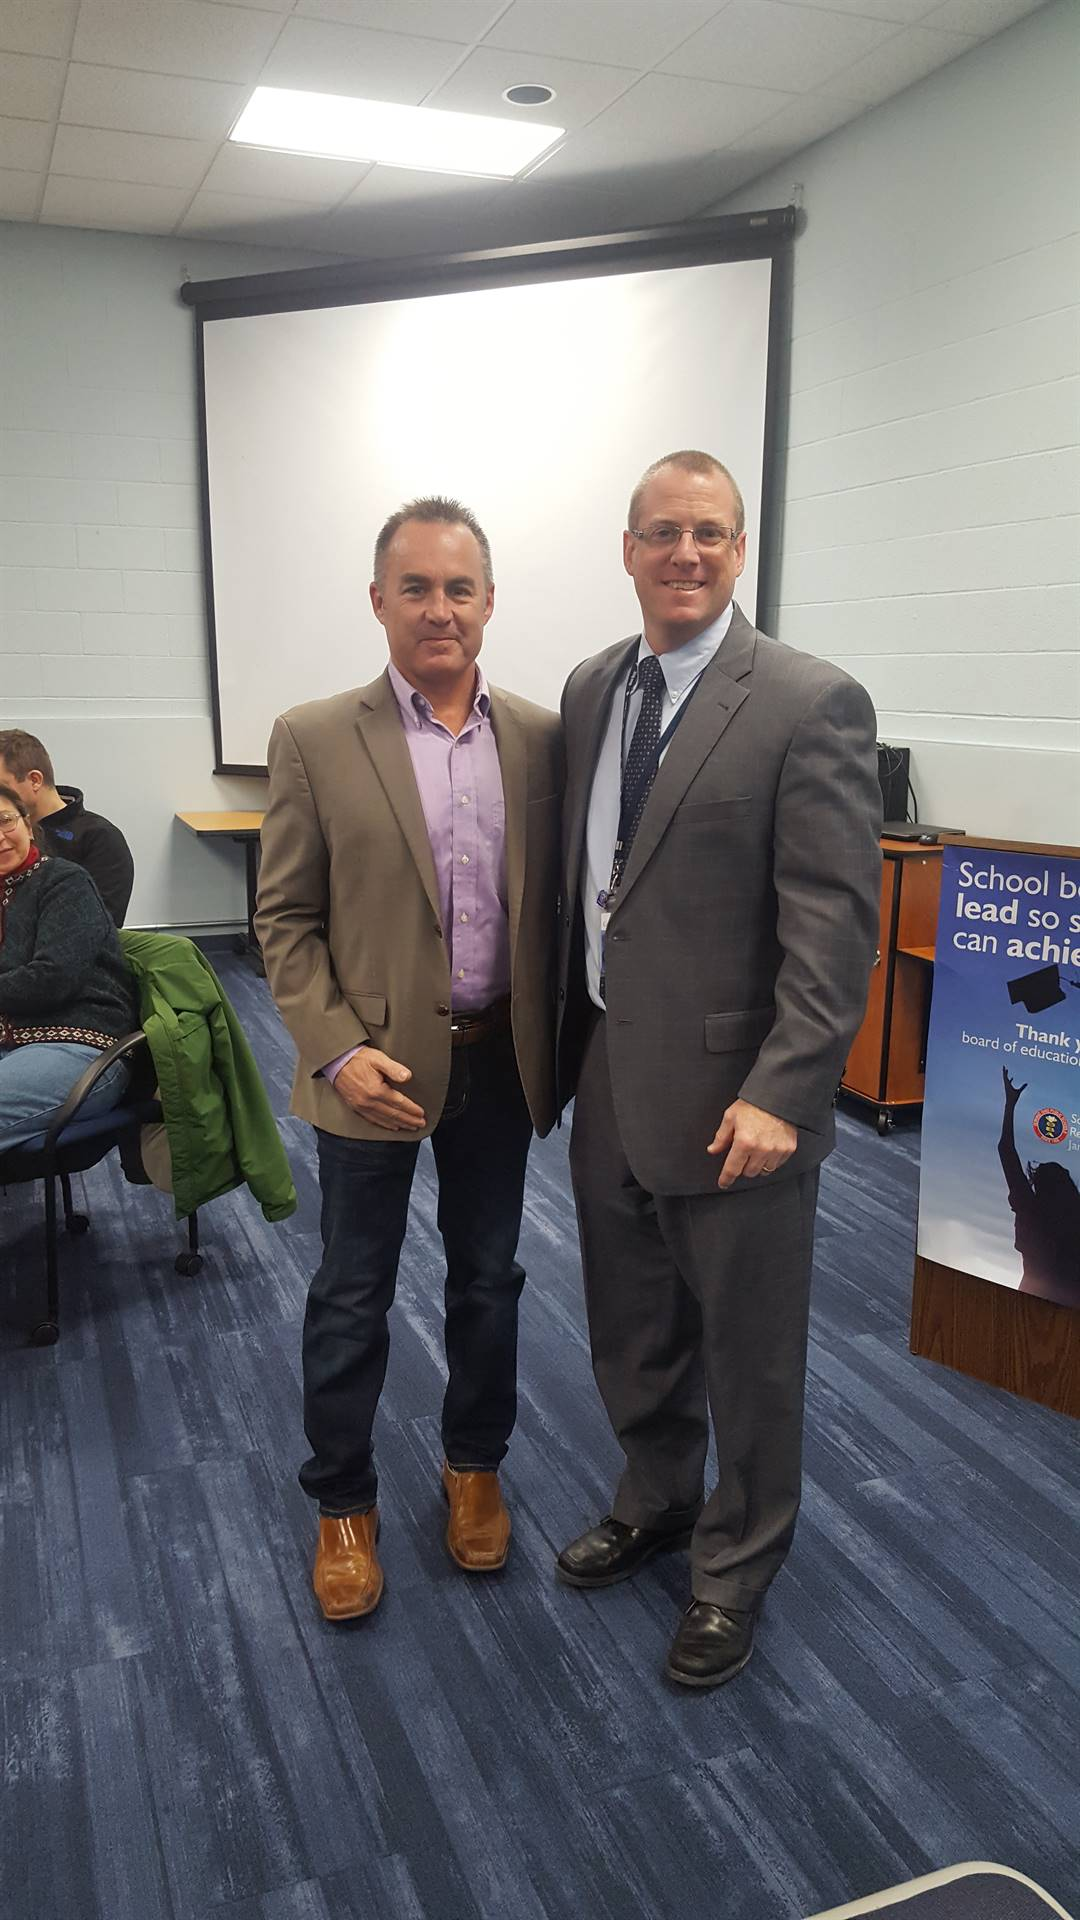 Brian Goss, Representative on GRD Board of Trustees